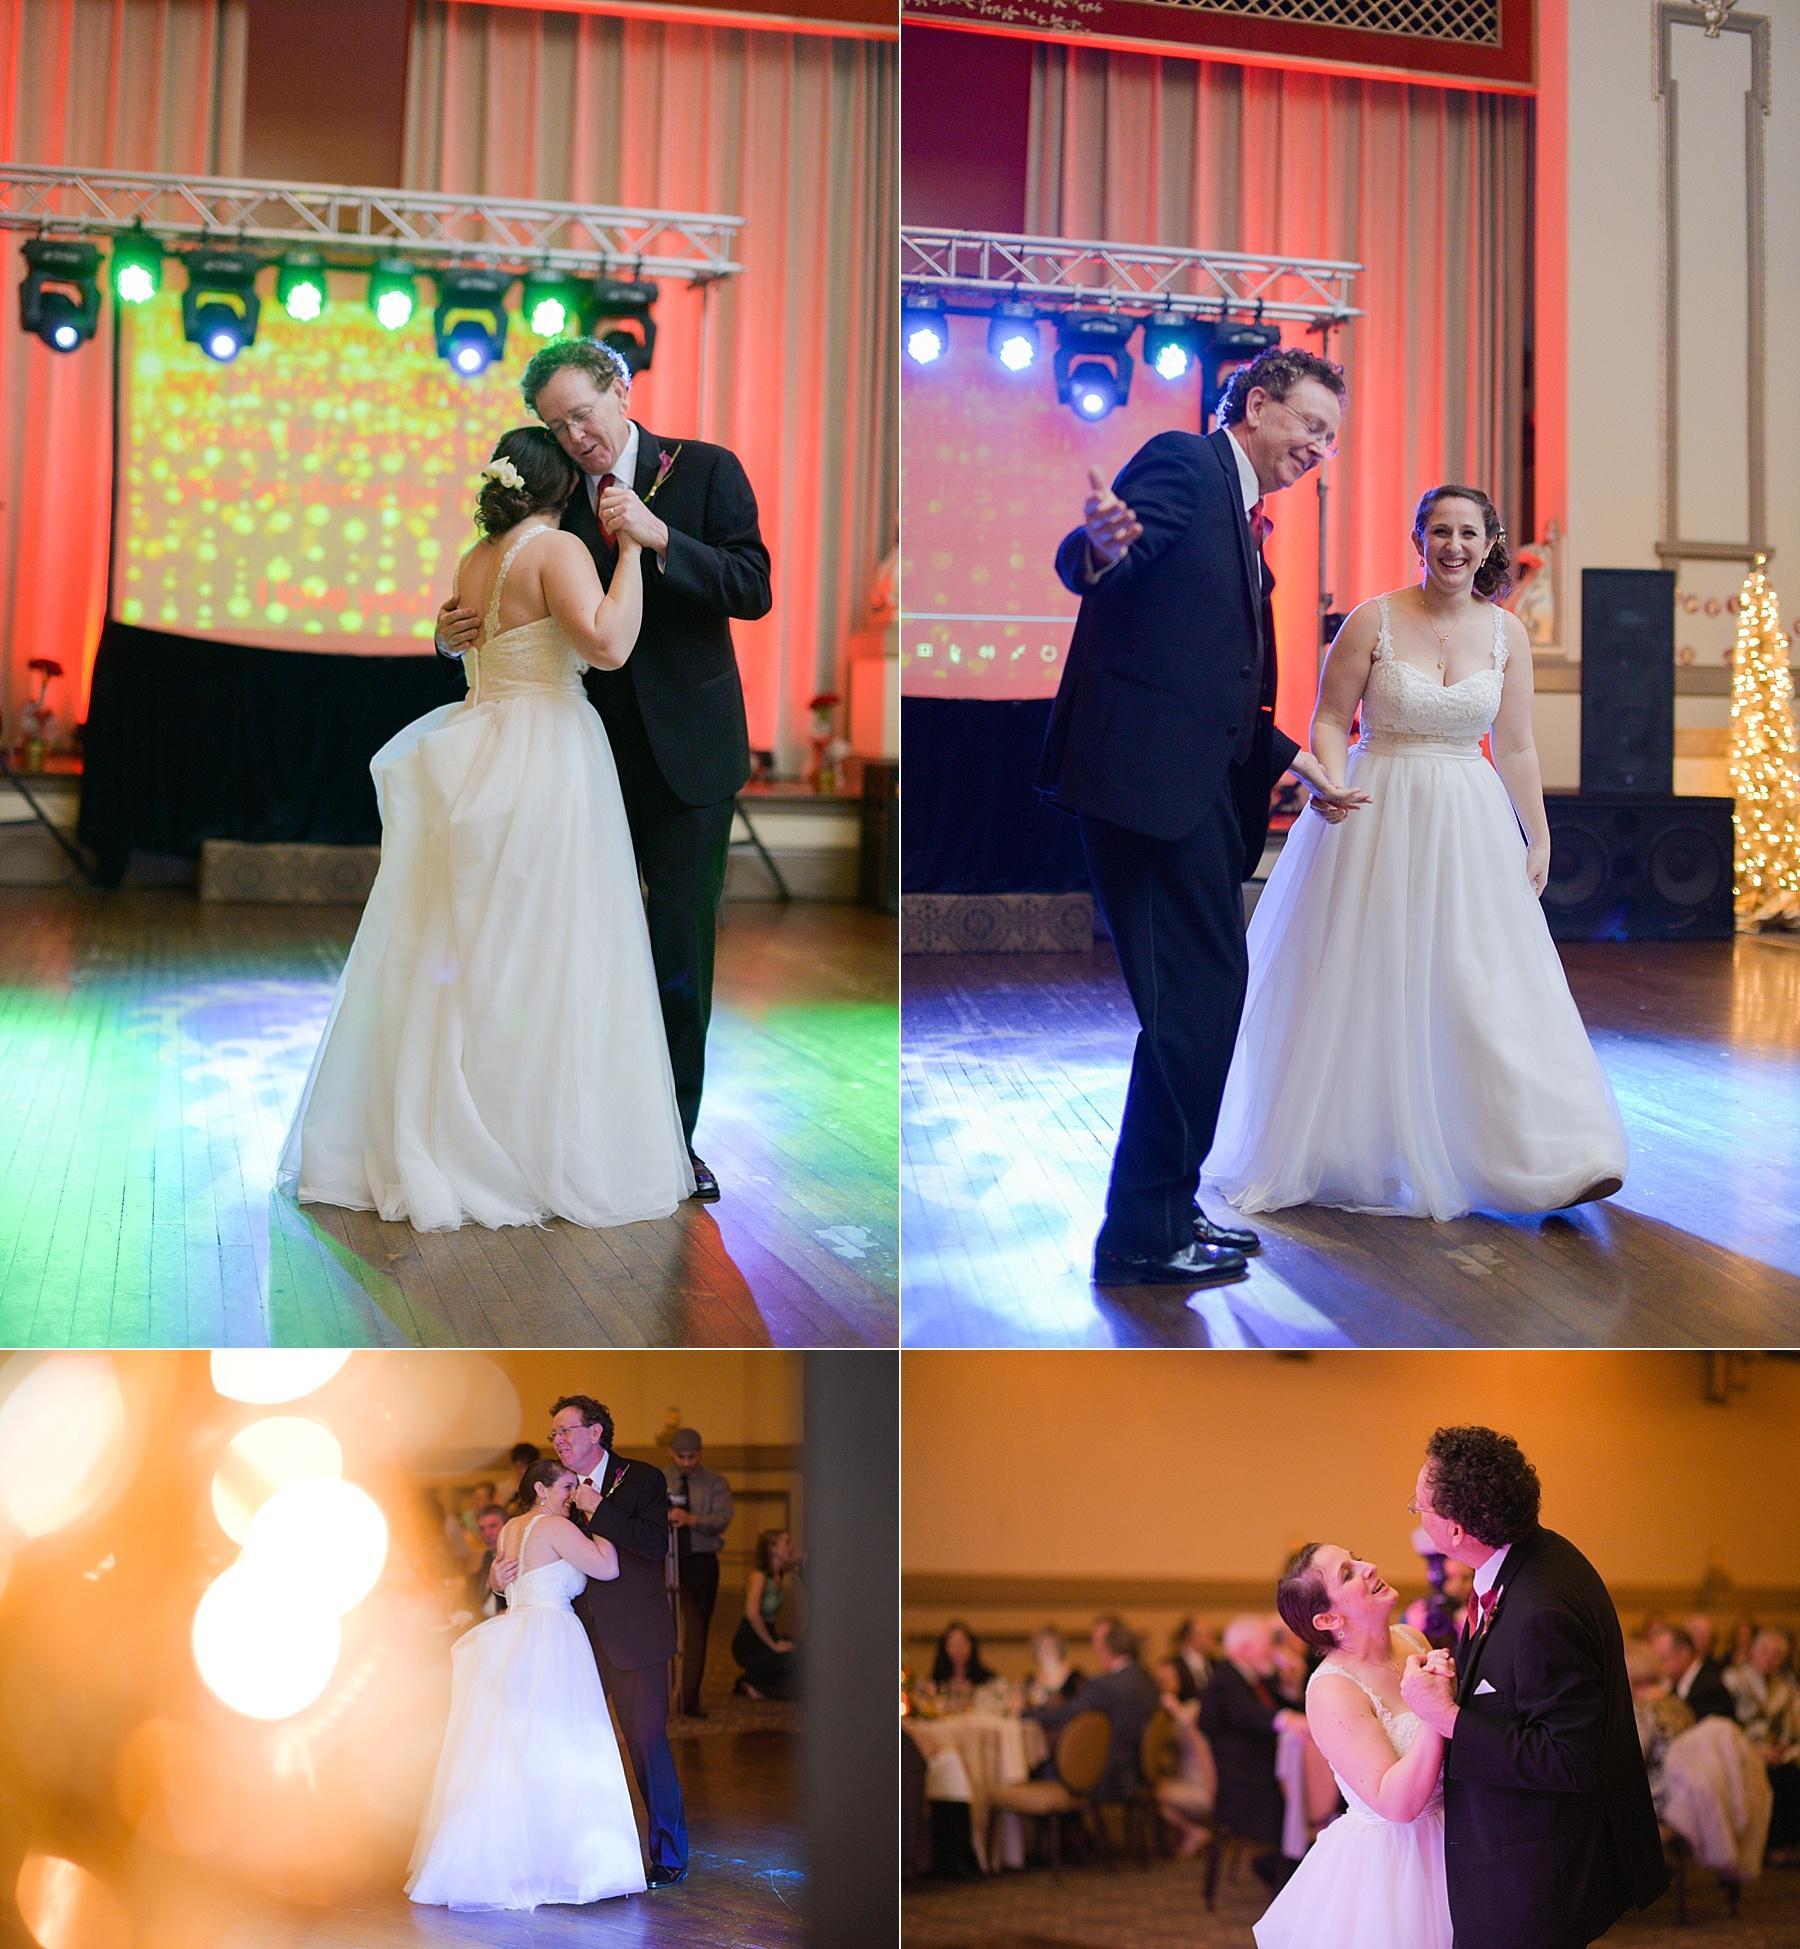 john-marshall-hotel-wedding-richmond-va_0053.jpg